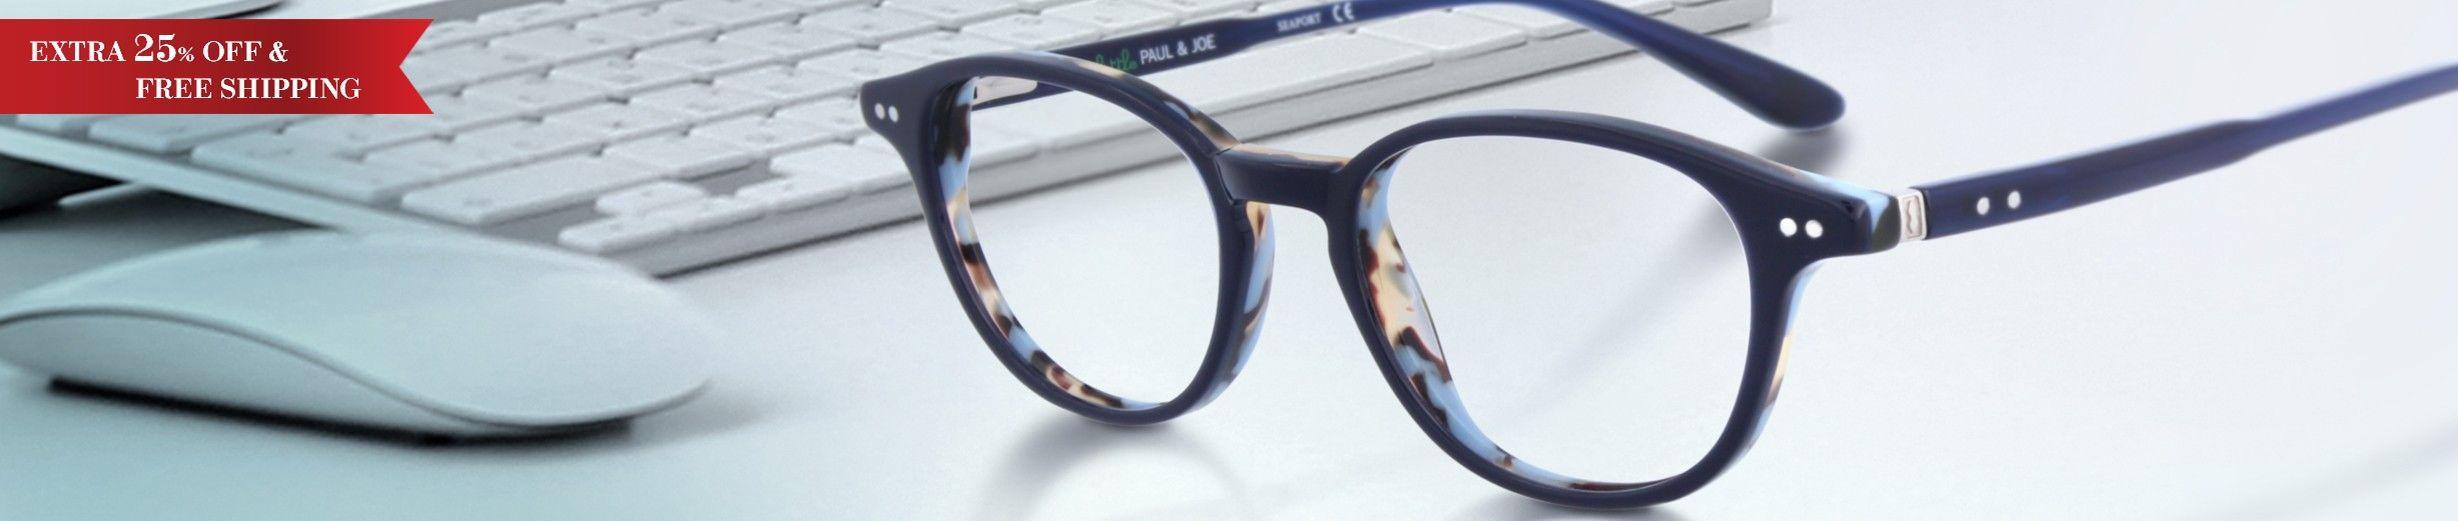 Glassesgallery - Pre-Teen Eyeglasses banner